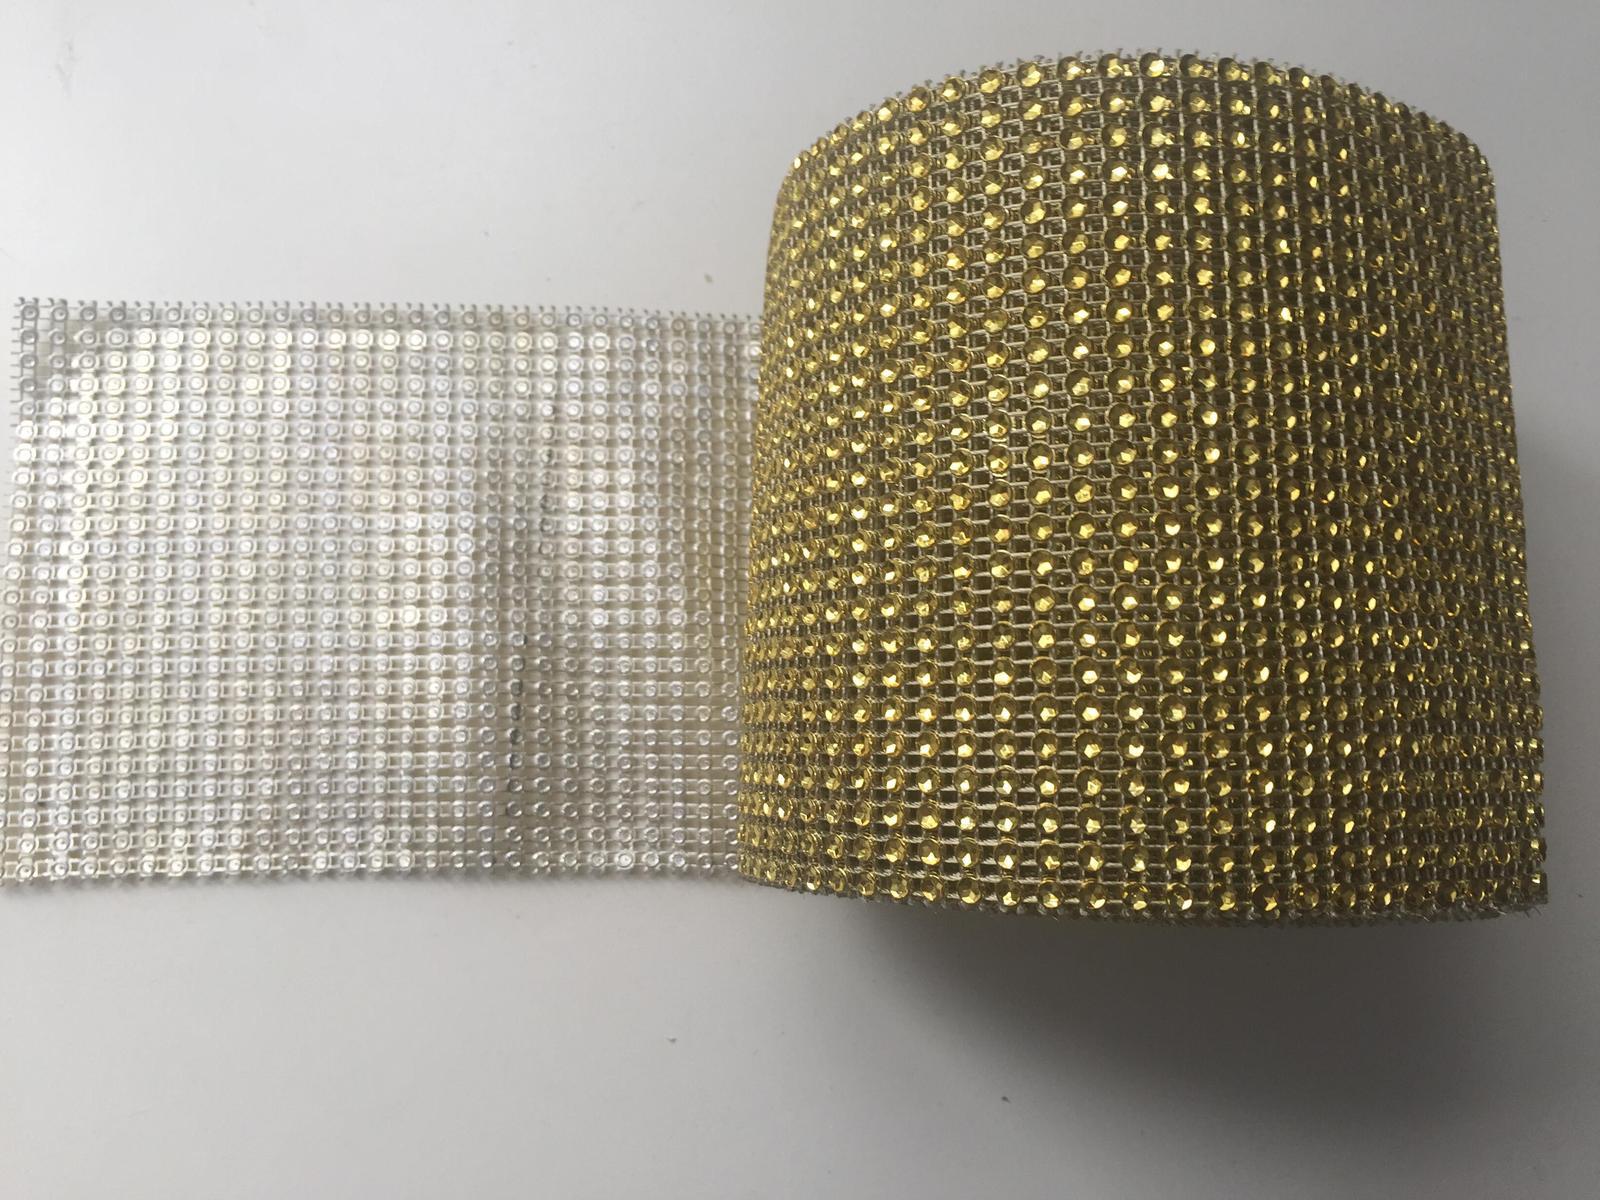 Zlata strasova stola na stol  - Obrázok č. 1